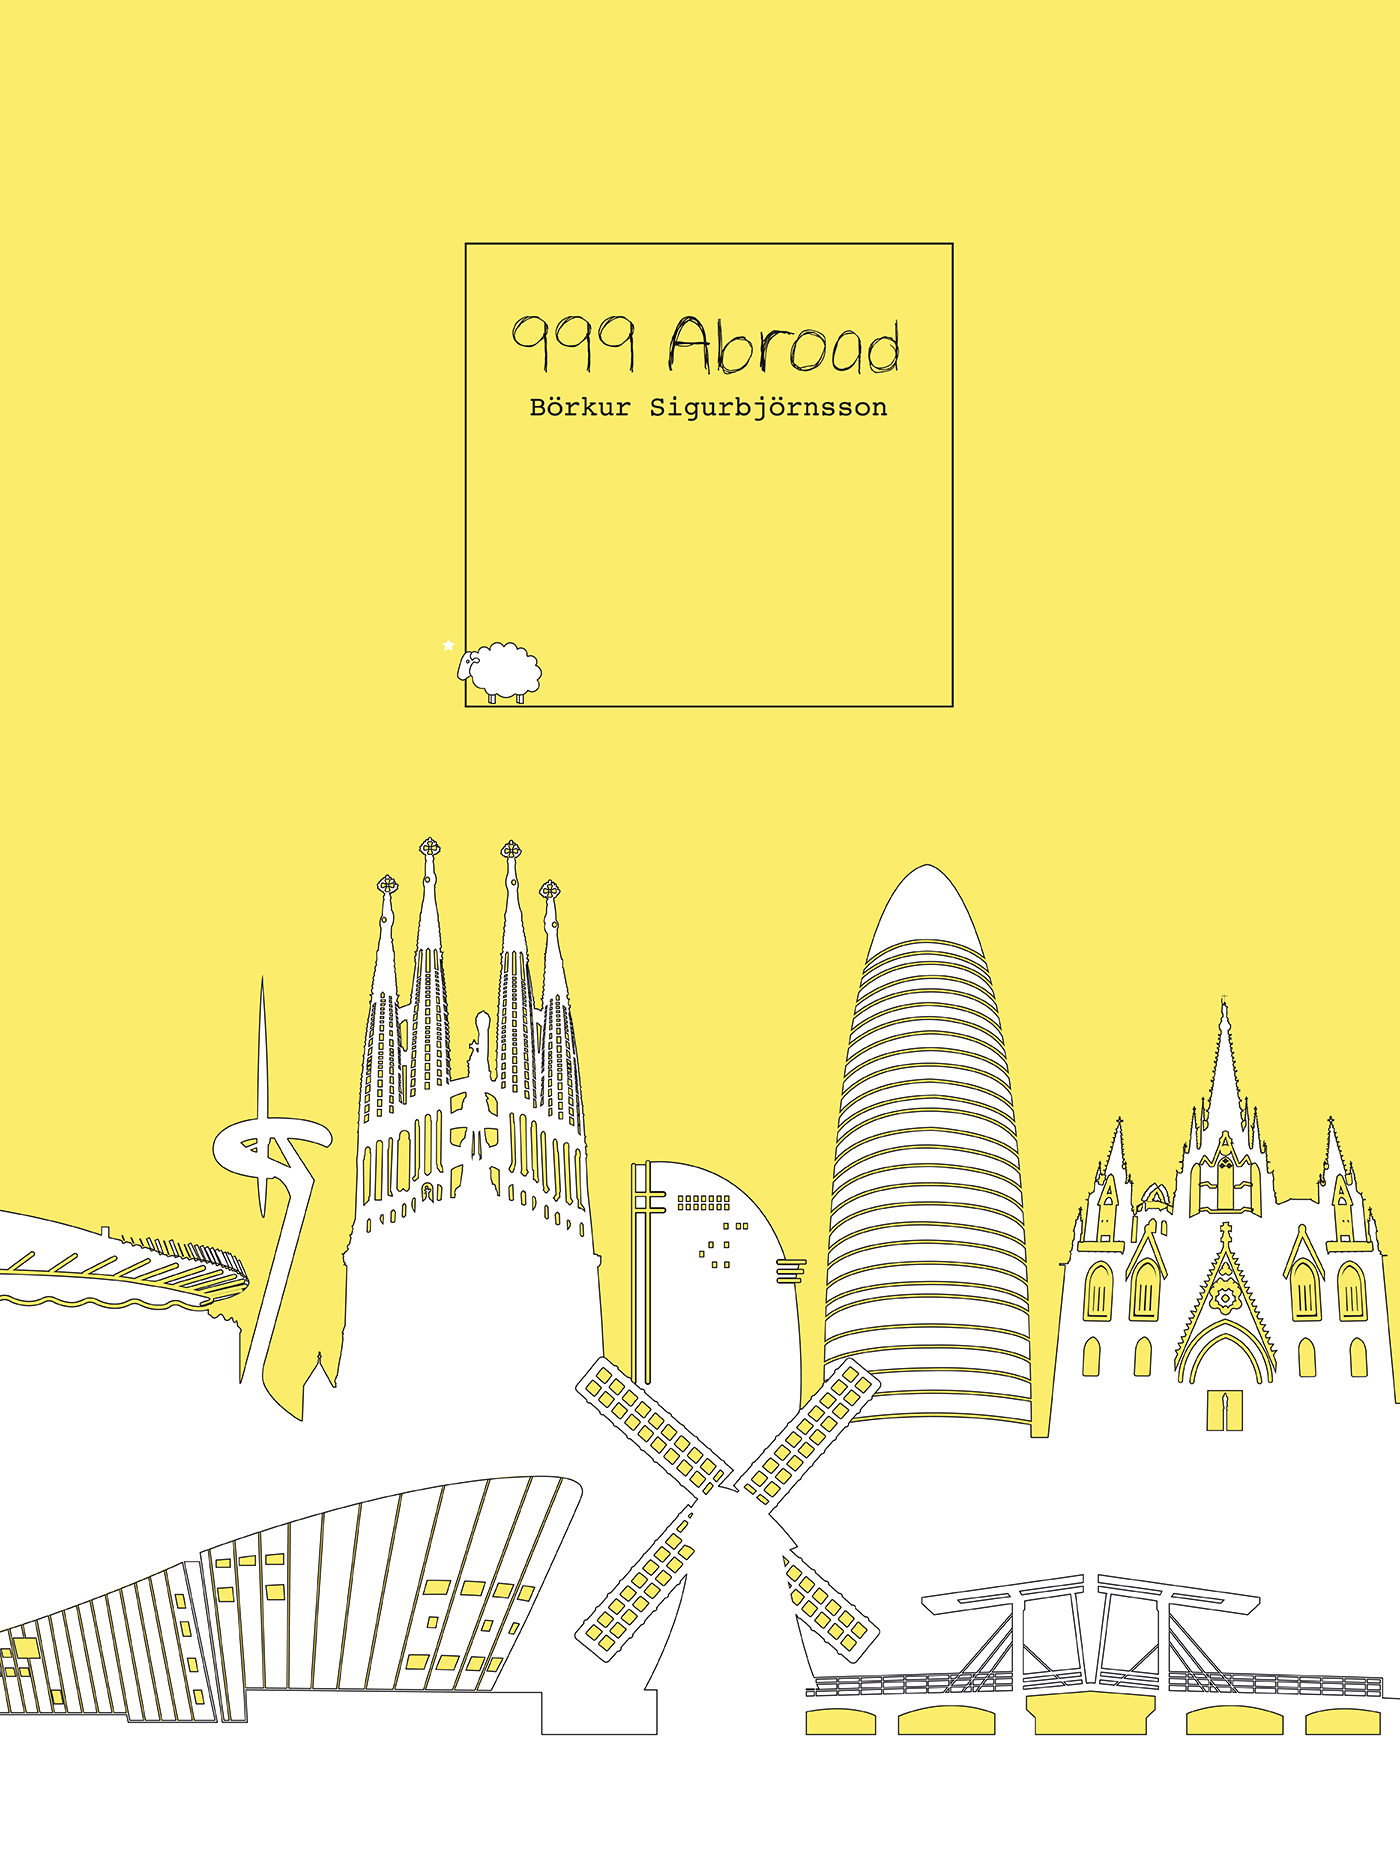 999 Abroad -- Cover design: Ana Piñeyro